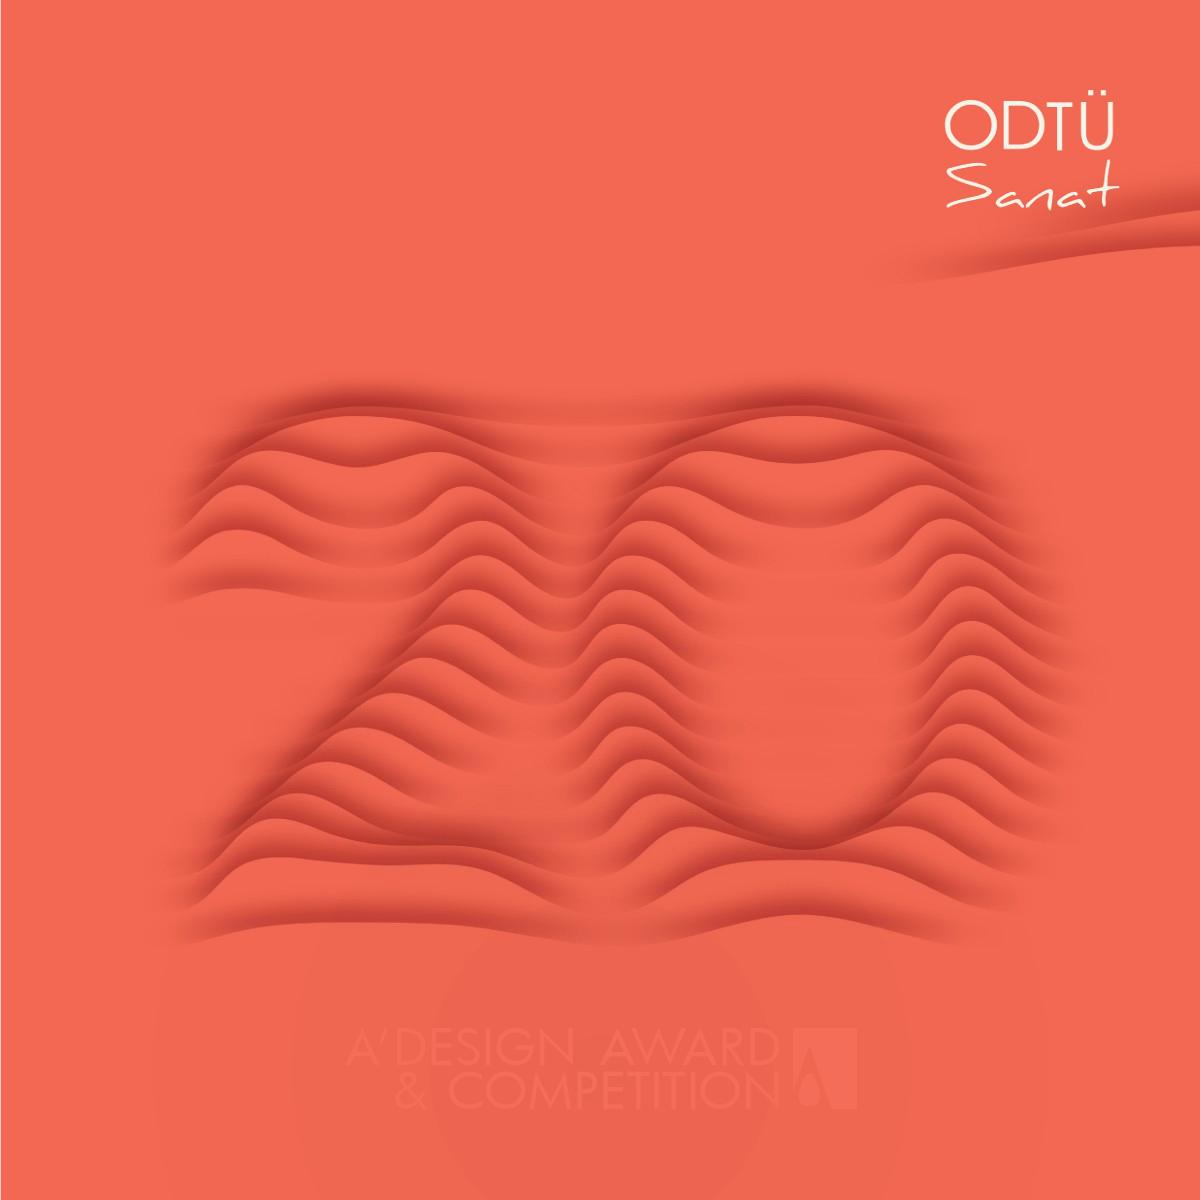 ODTU Sanat 20 Visual Identity Design